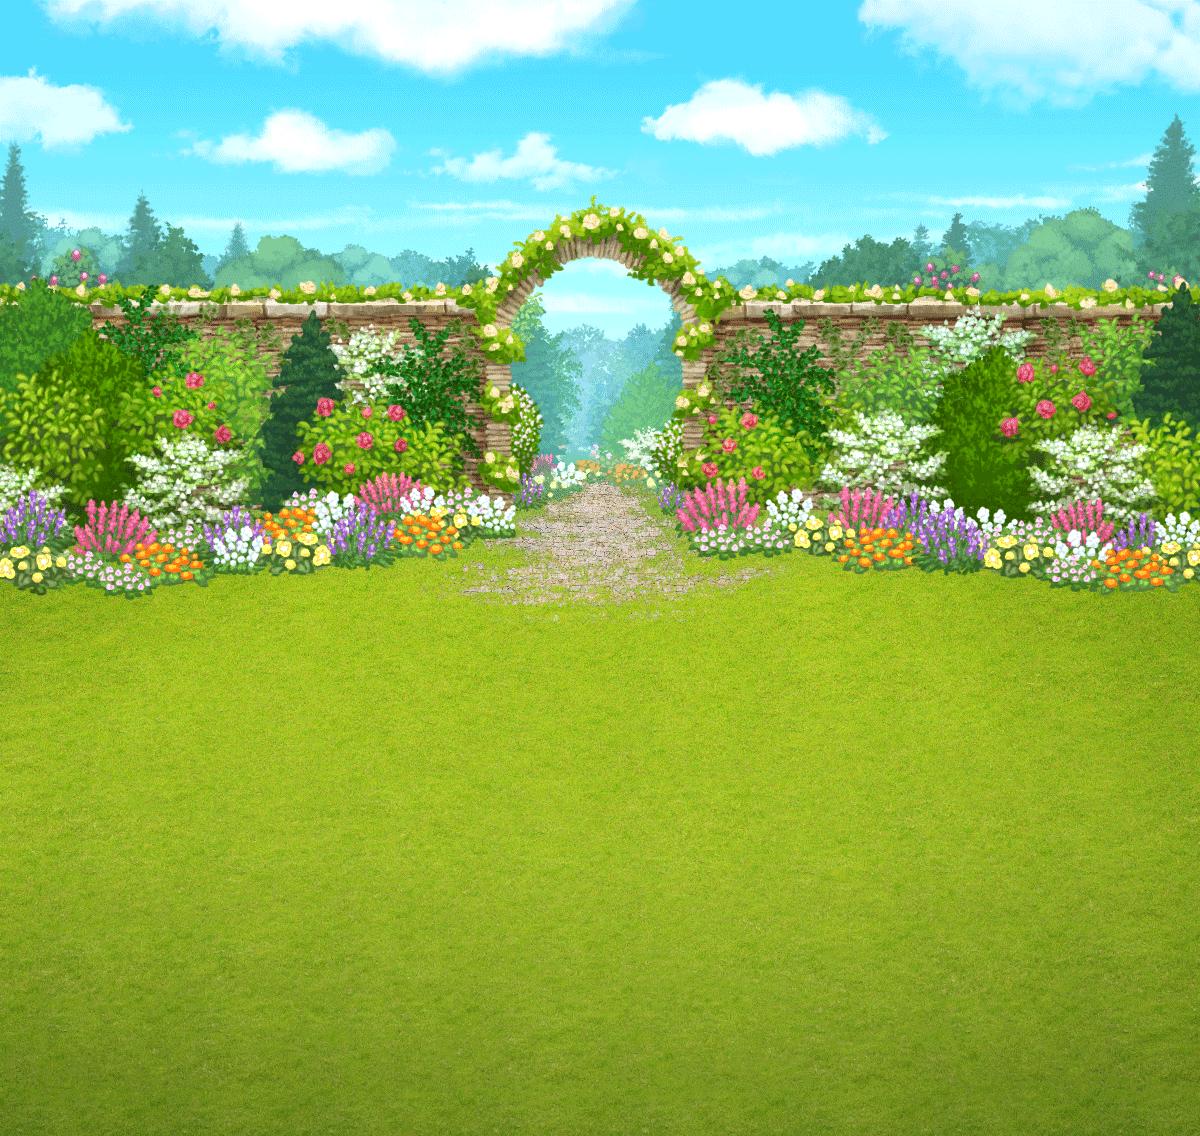 Garden Background Hd Png.